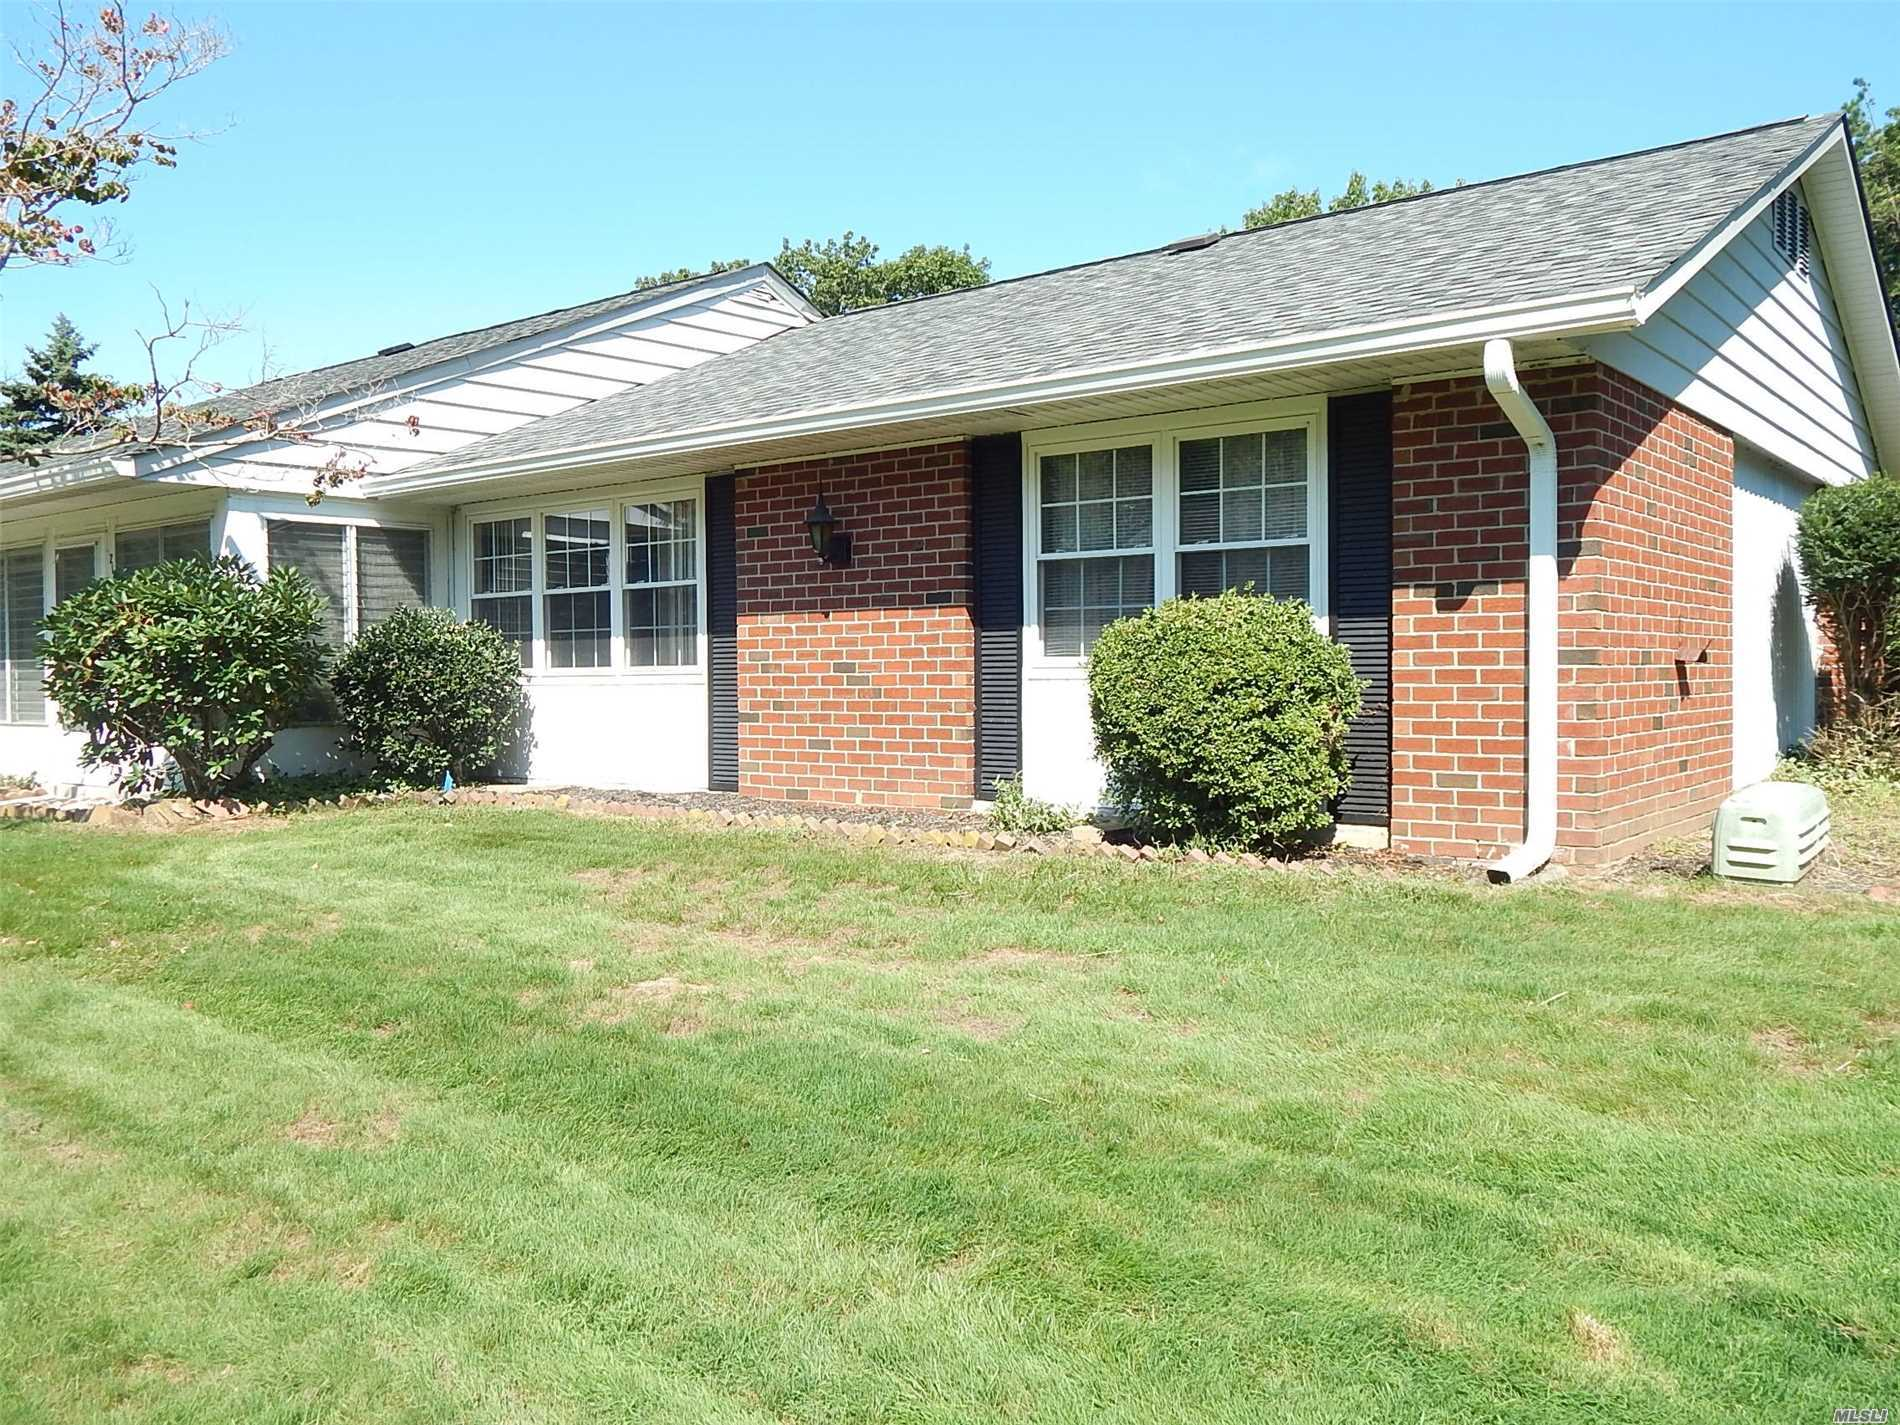 Property for sale at 215 B Woodbridge Dr, Ridge,  NY 11961